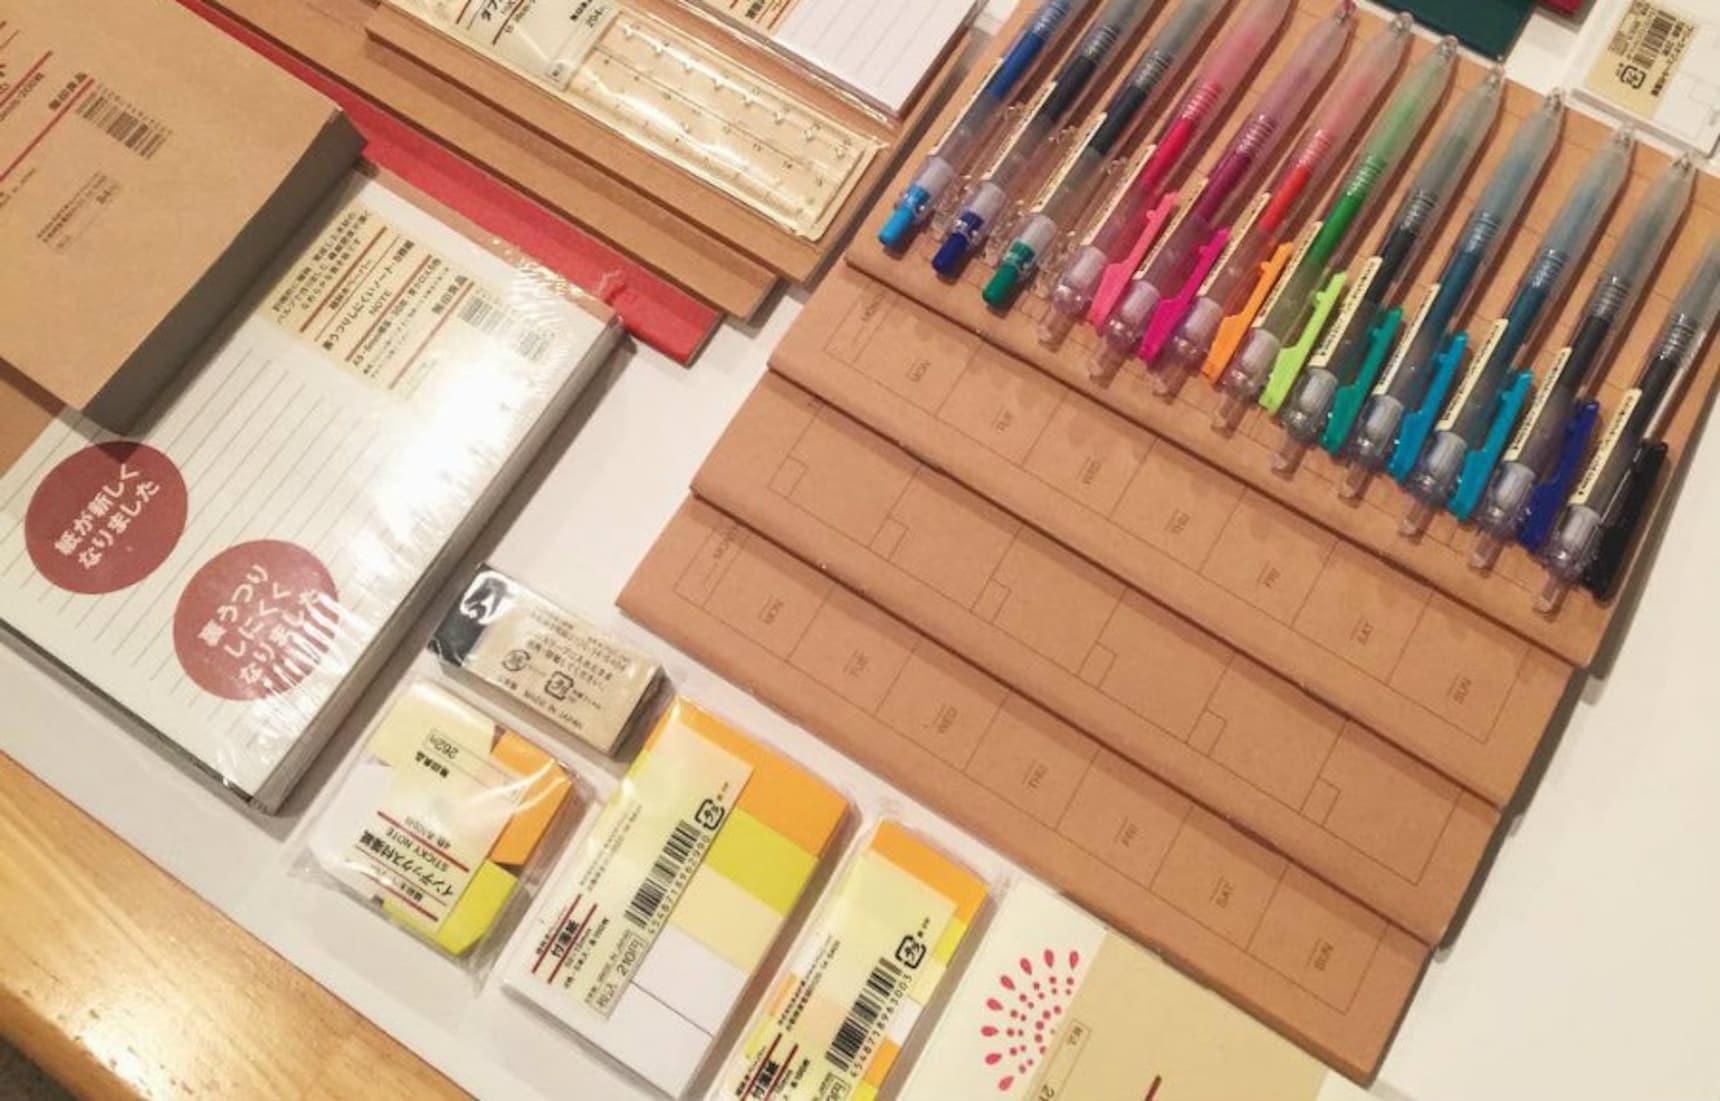 Life-Enhancing Stationery (& More) from Muji!